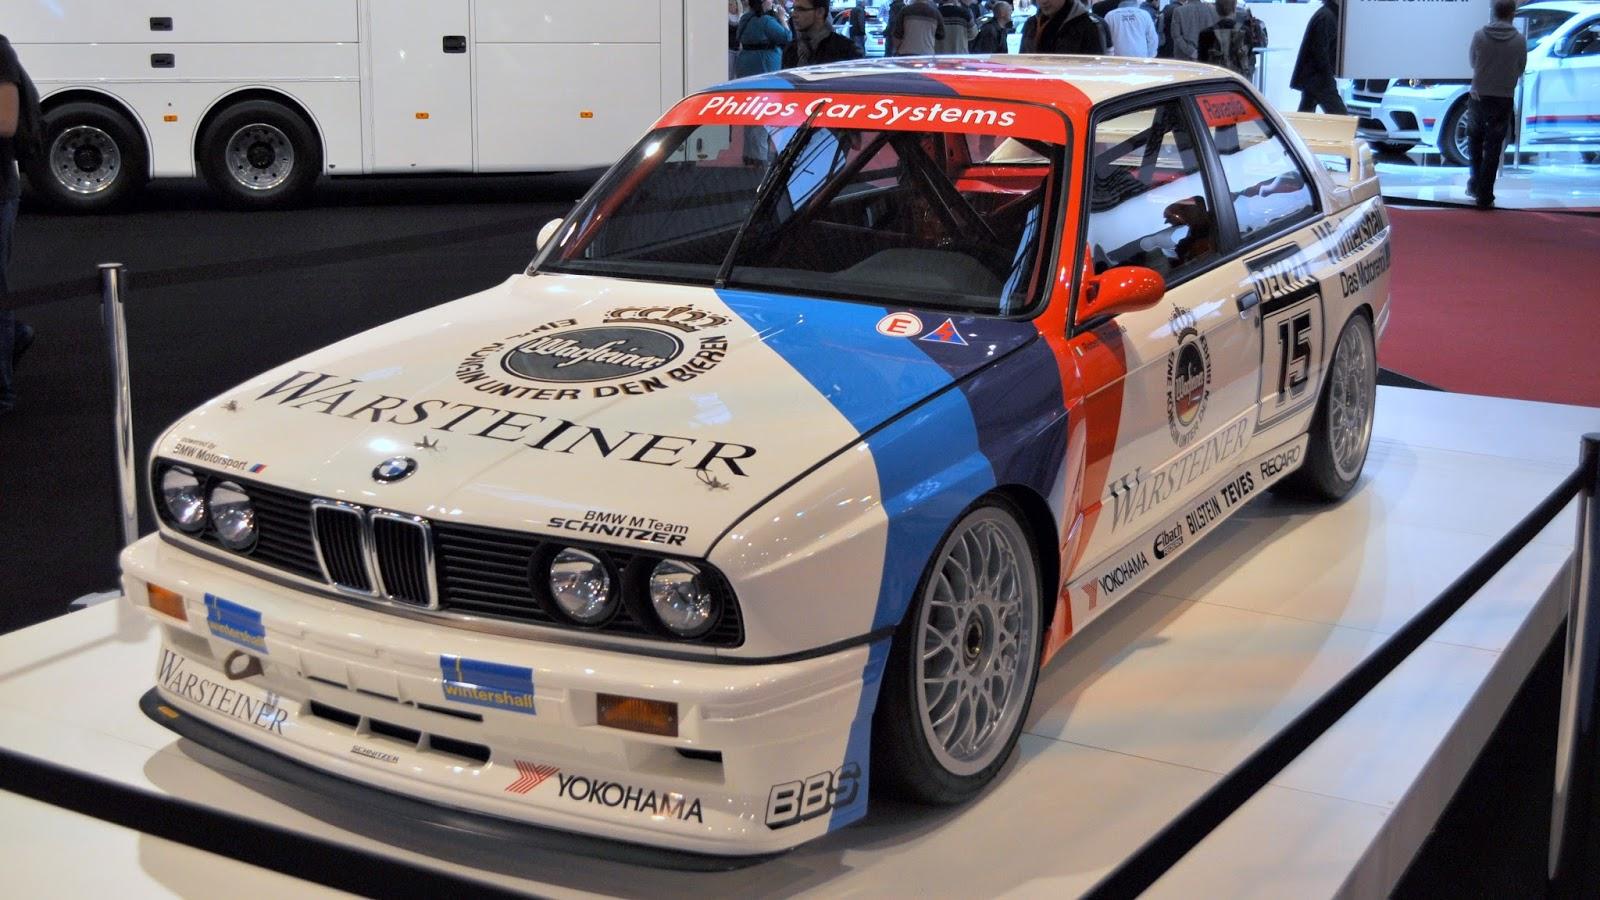 BMW E30 M3 1 H BMW M2 είναι ο (άξιος) διάδοχος της 2002 turbo και της Ε30 μαζί BMW, BMW 2002 turbo, BMW M2, BMW M3 E30, videos, zblog, φωτογραφίες